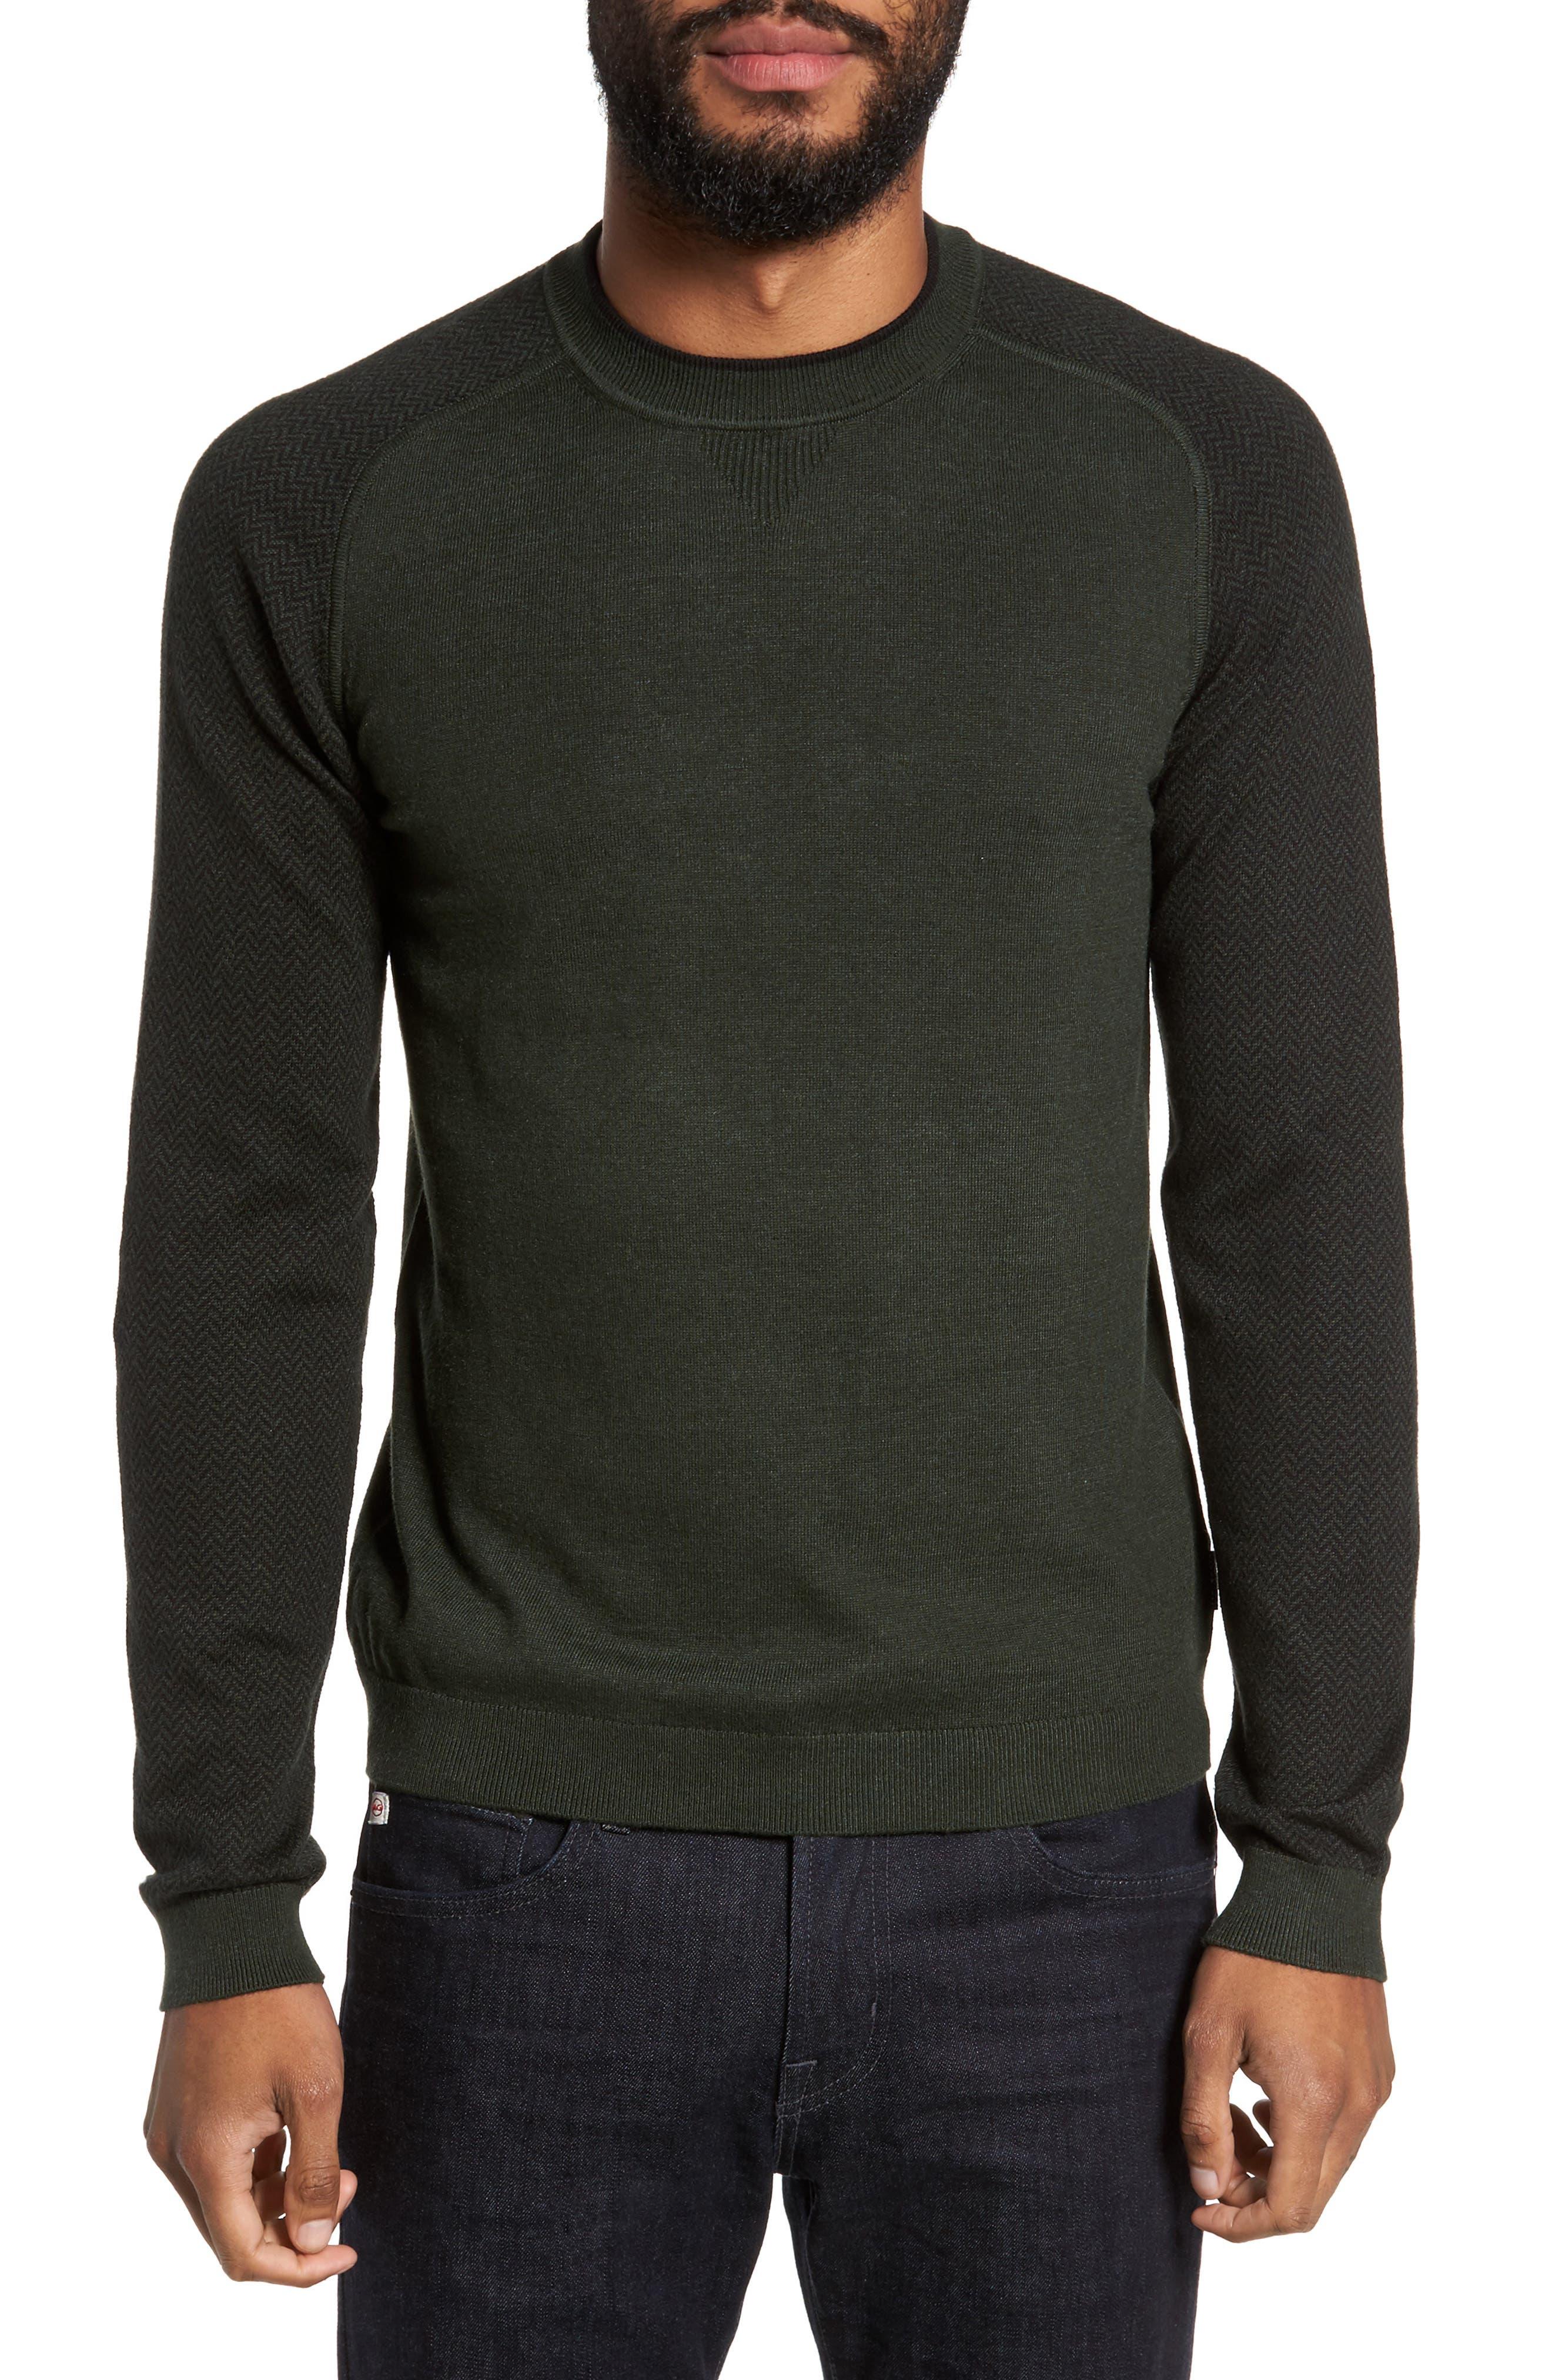 Pepmint Herringbone Sleeve Sweatshirt,                             Main thumbnail 1, color,                             Khaki